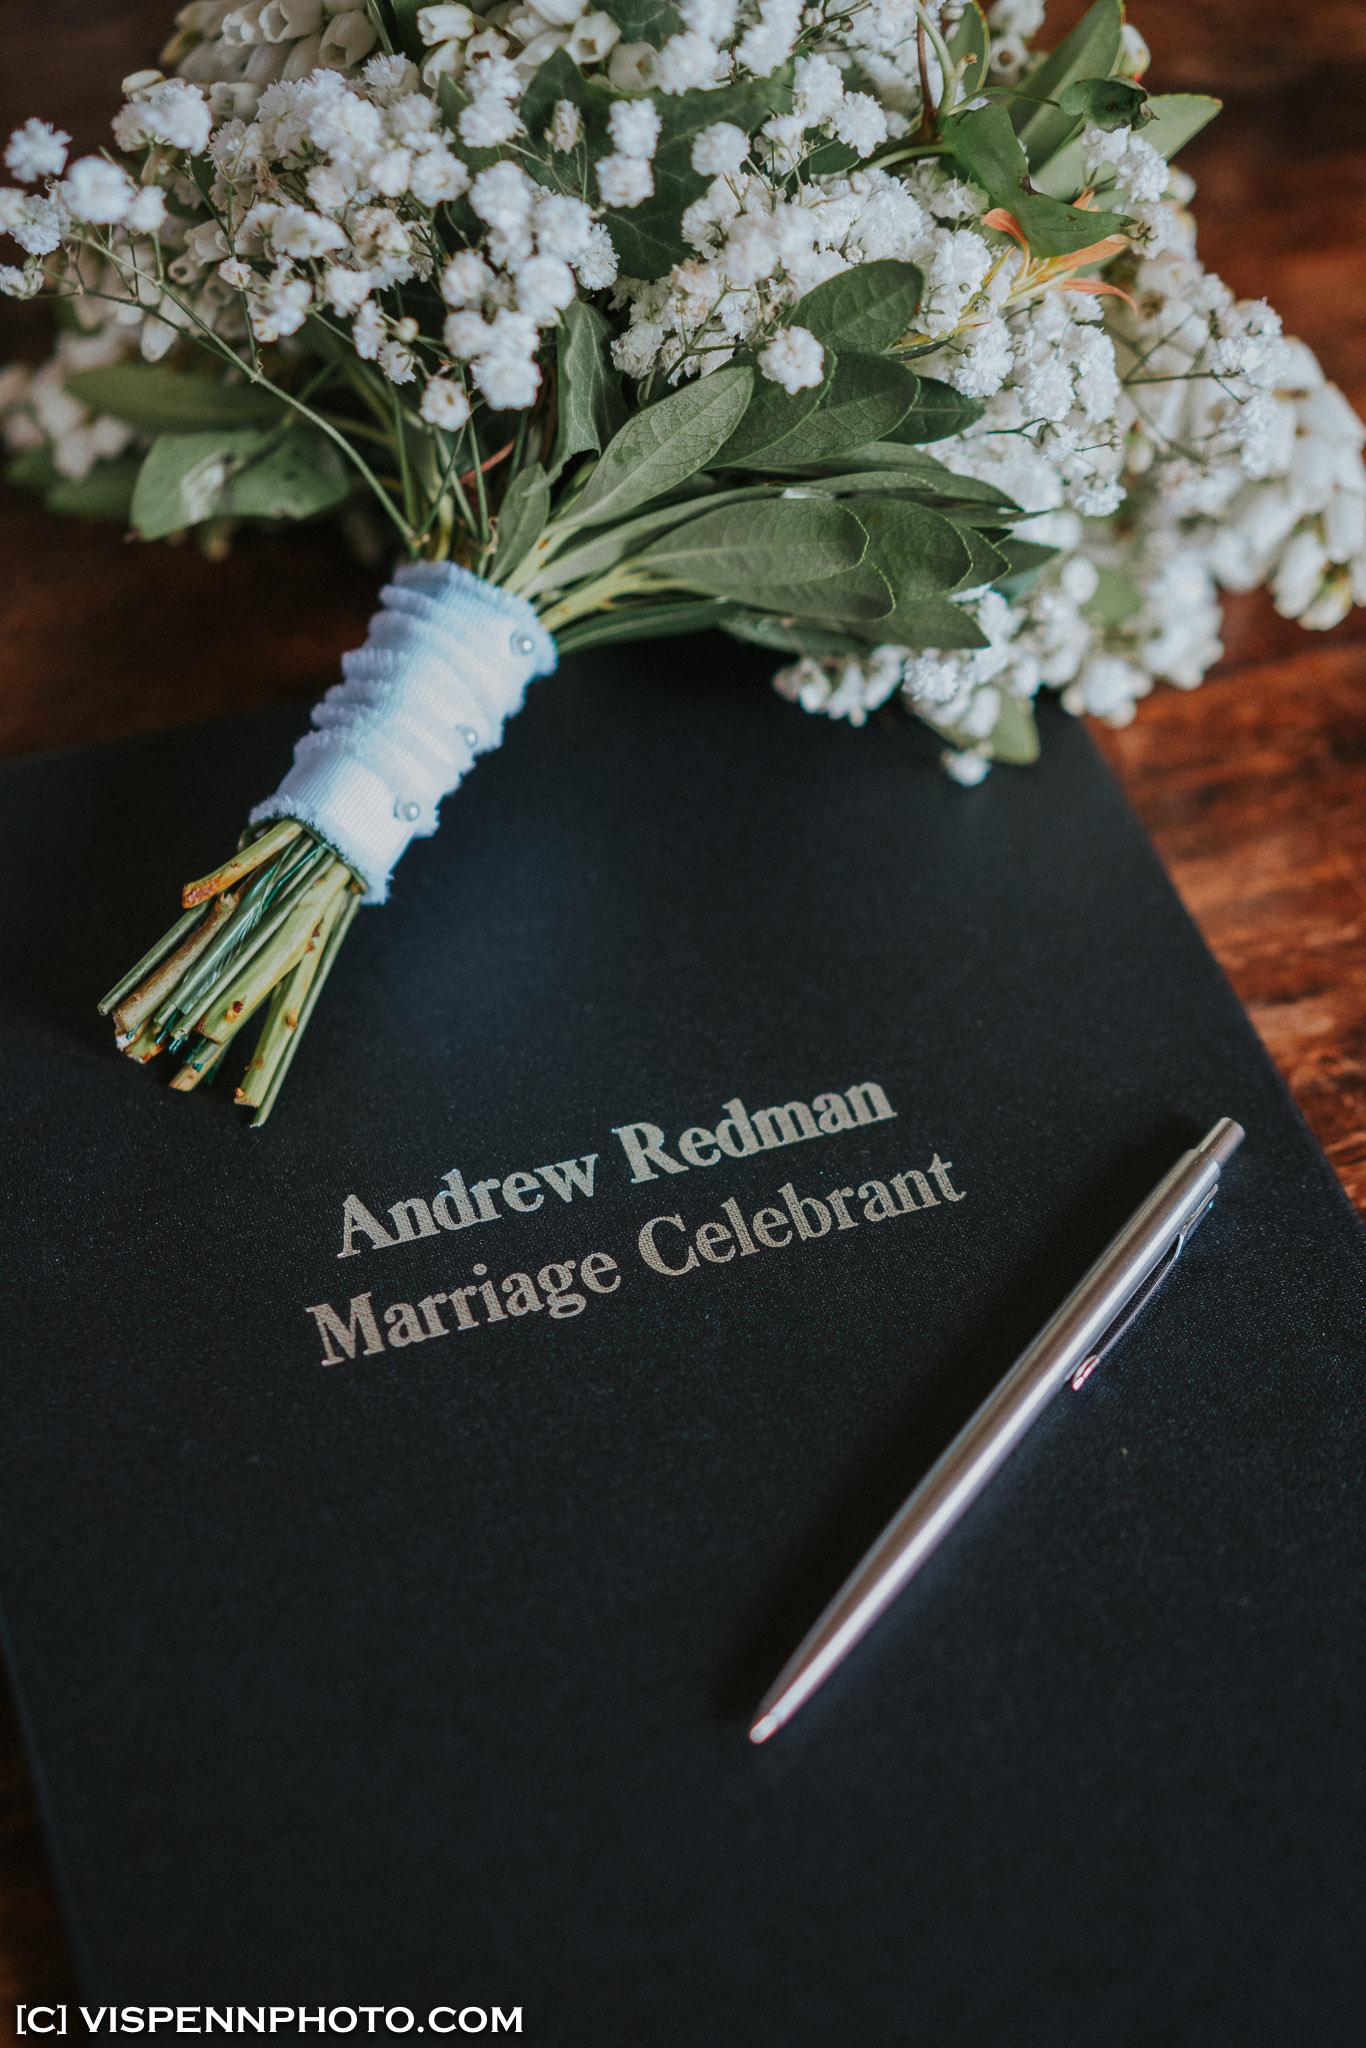 WEDDING DAY Photography Melbourne VISPENN 墨尔本 婚礼跟拍 婚礼摄像 婚礼摄影 结婚照 登记照 LeanneWesley 03909 4H A7R3 VISPENN